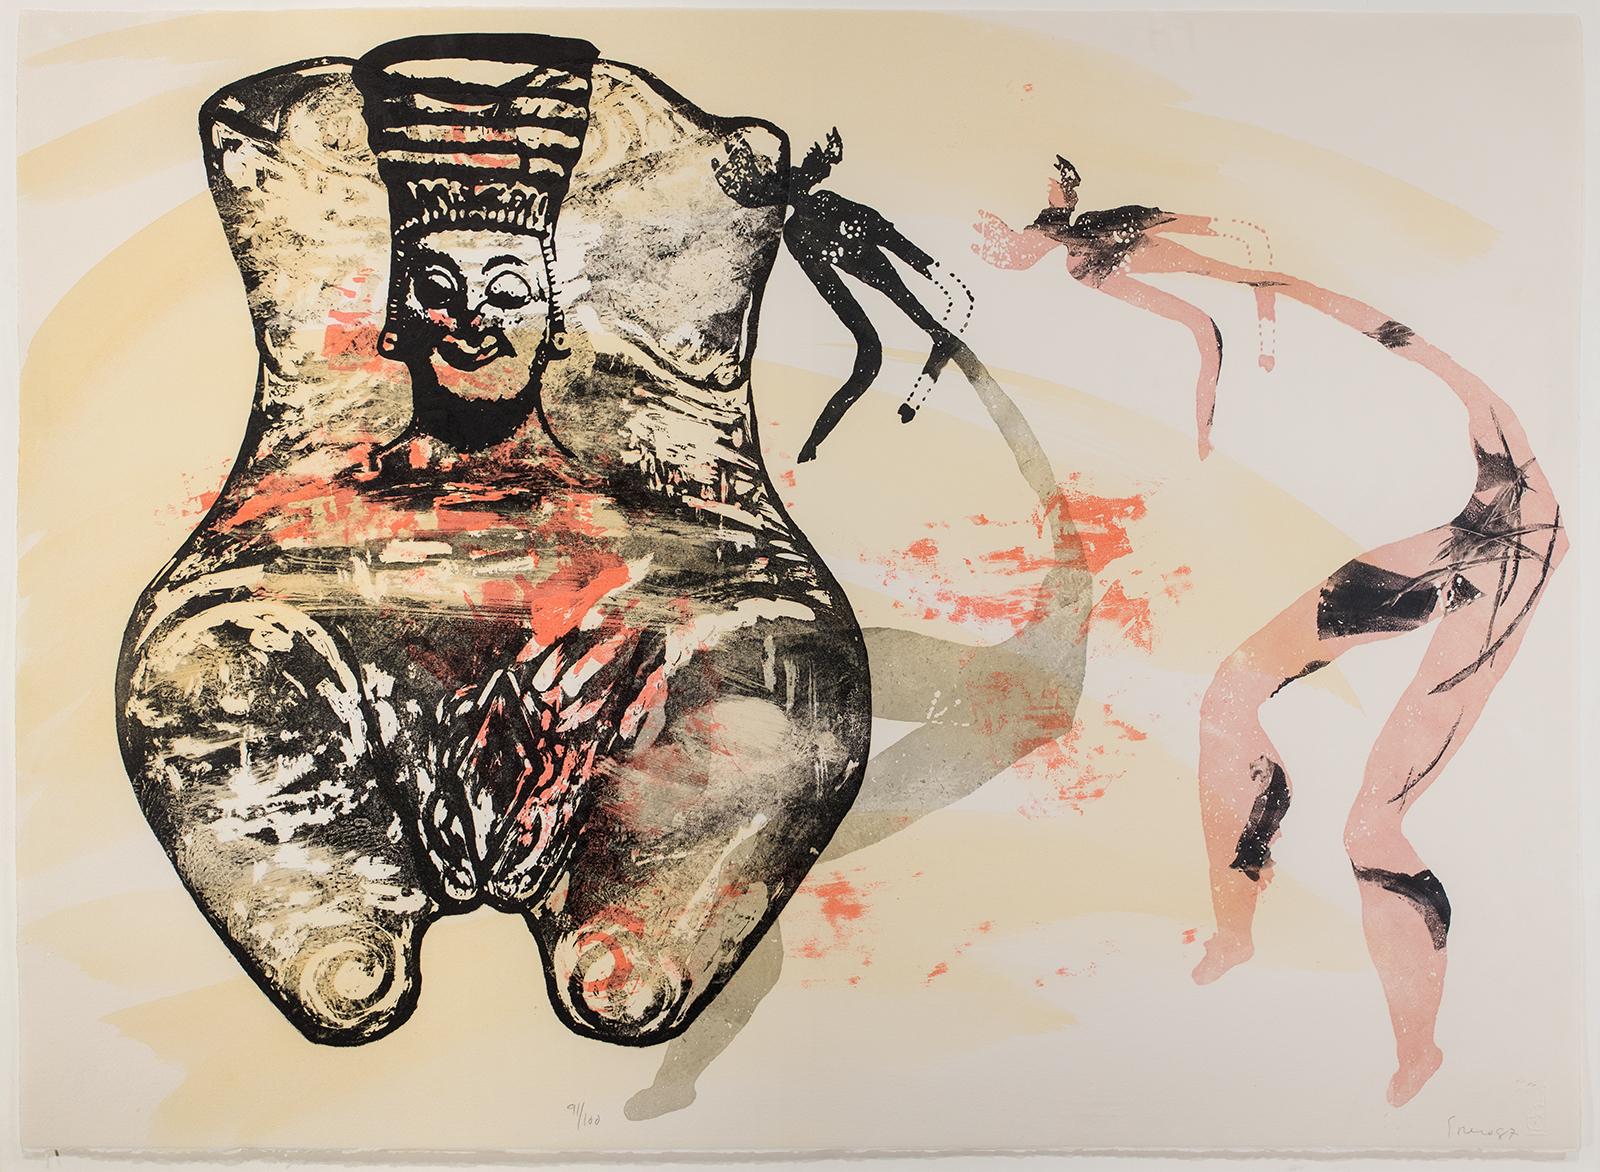 Nancy Spero, Goddess, 1987